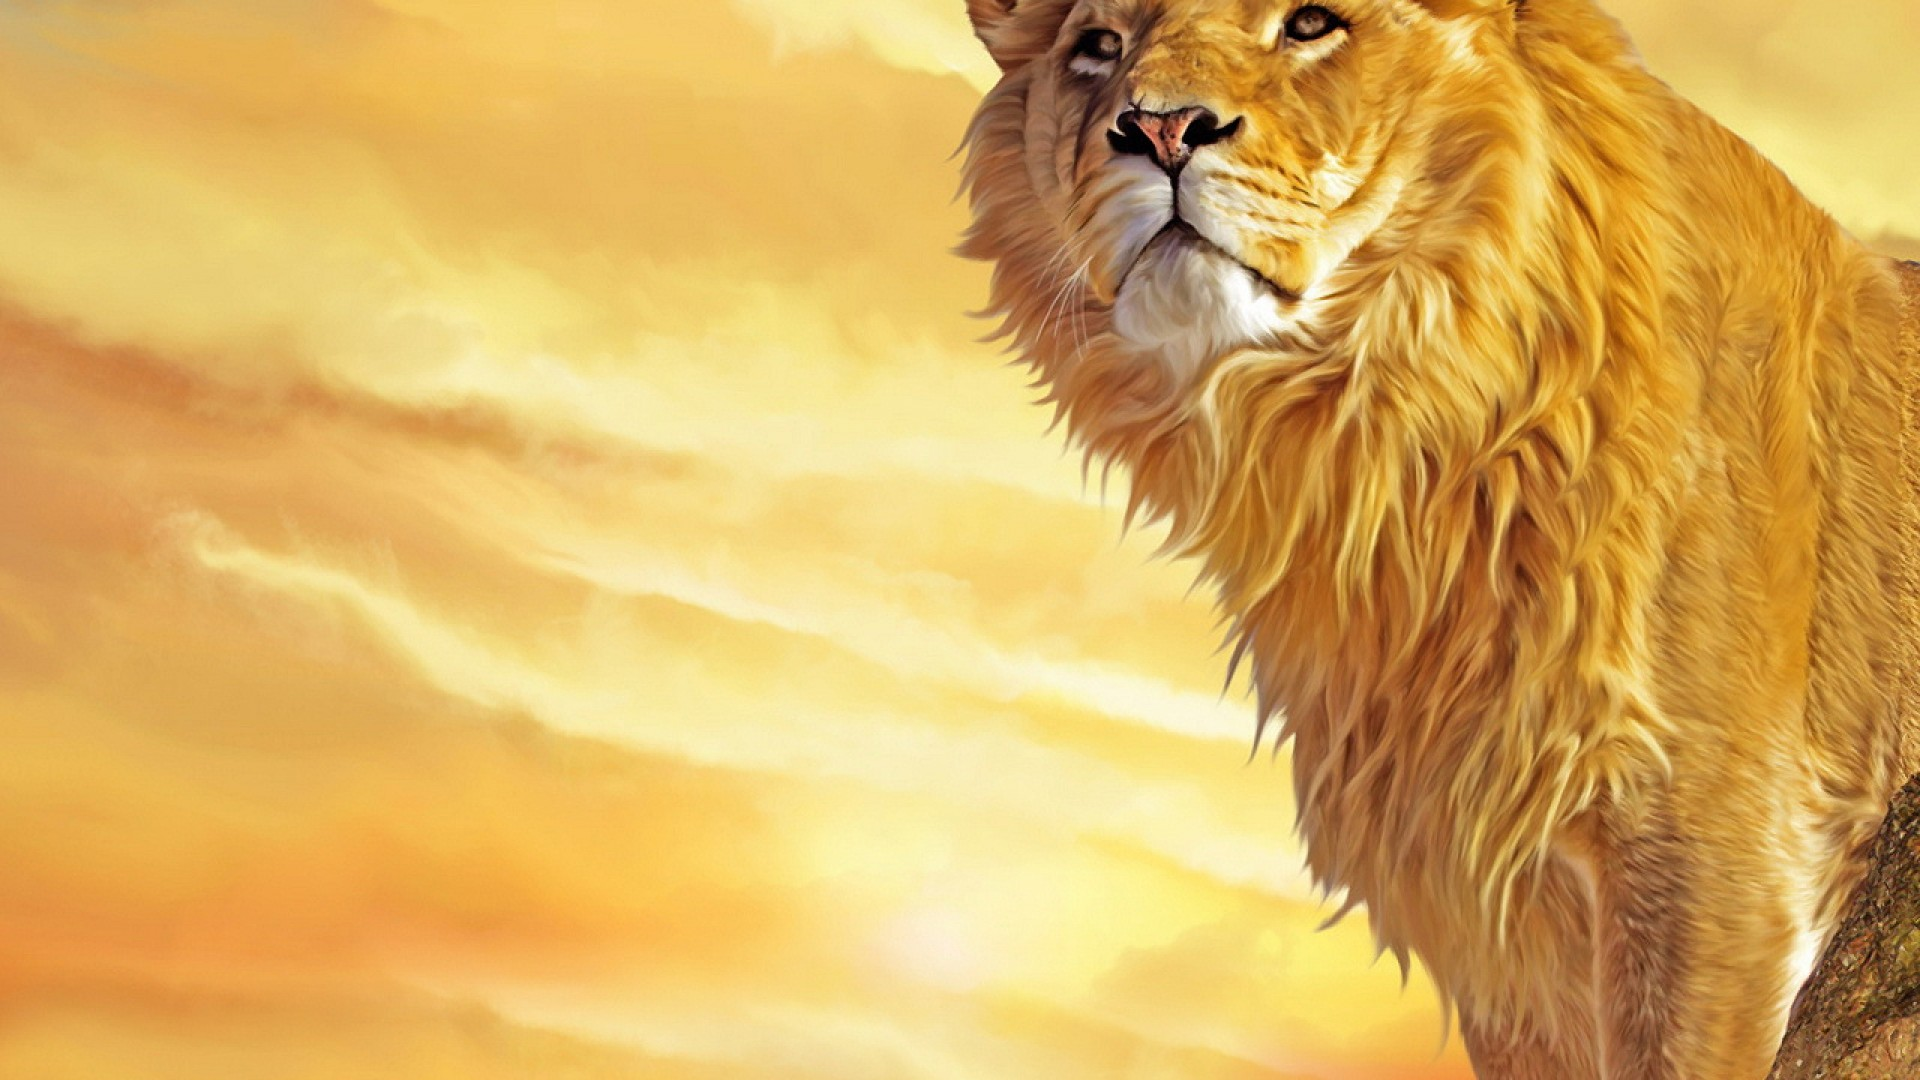 Lion Background 1920x1080 Wallpaper Teahub Io